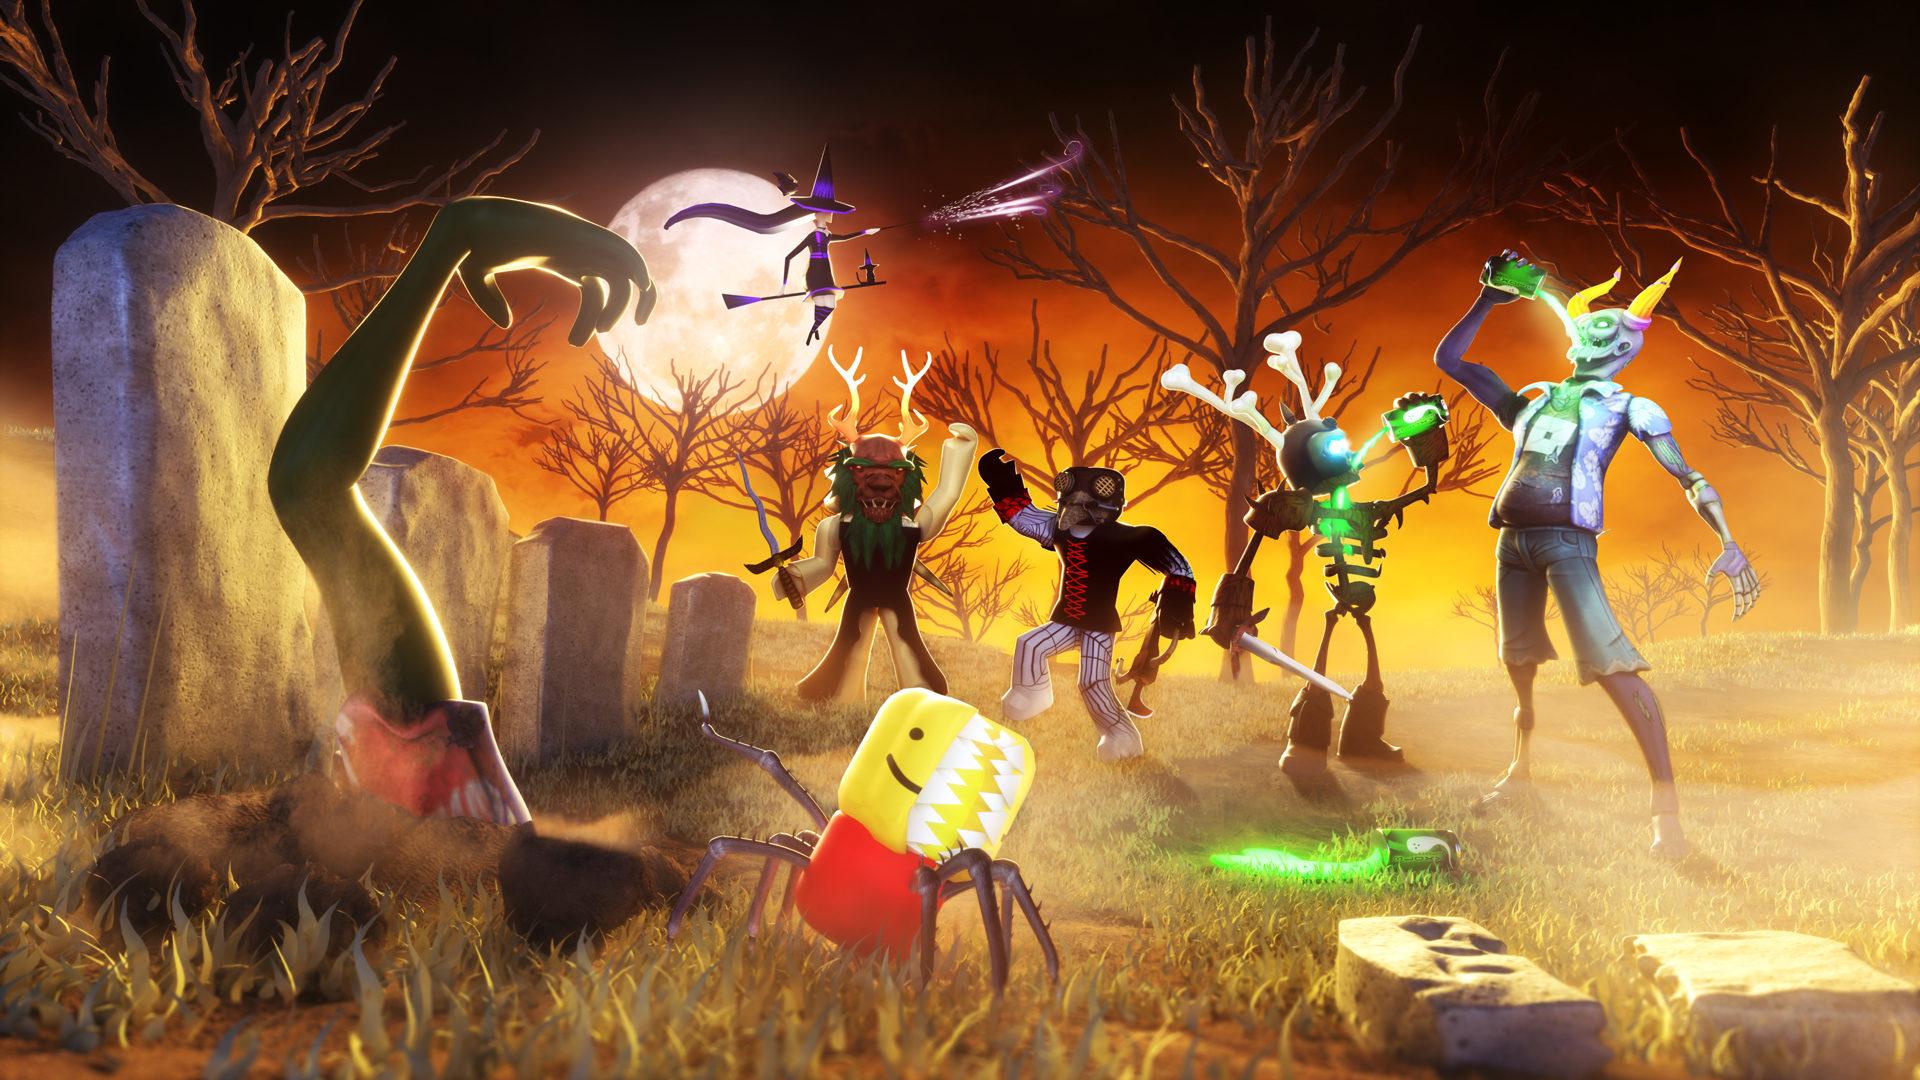 Roblox Events Halloween 2020 Halloween Sale 2019 | Roblox Wikia | Fandom